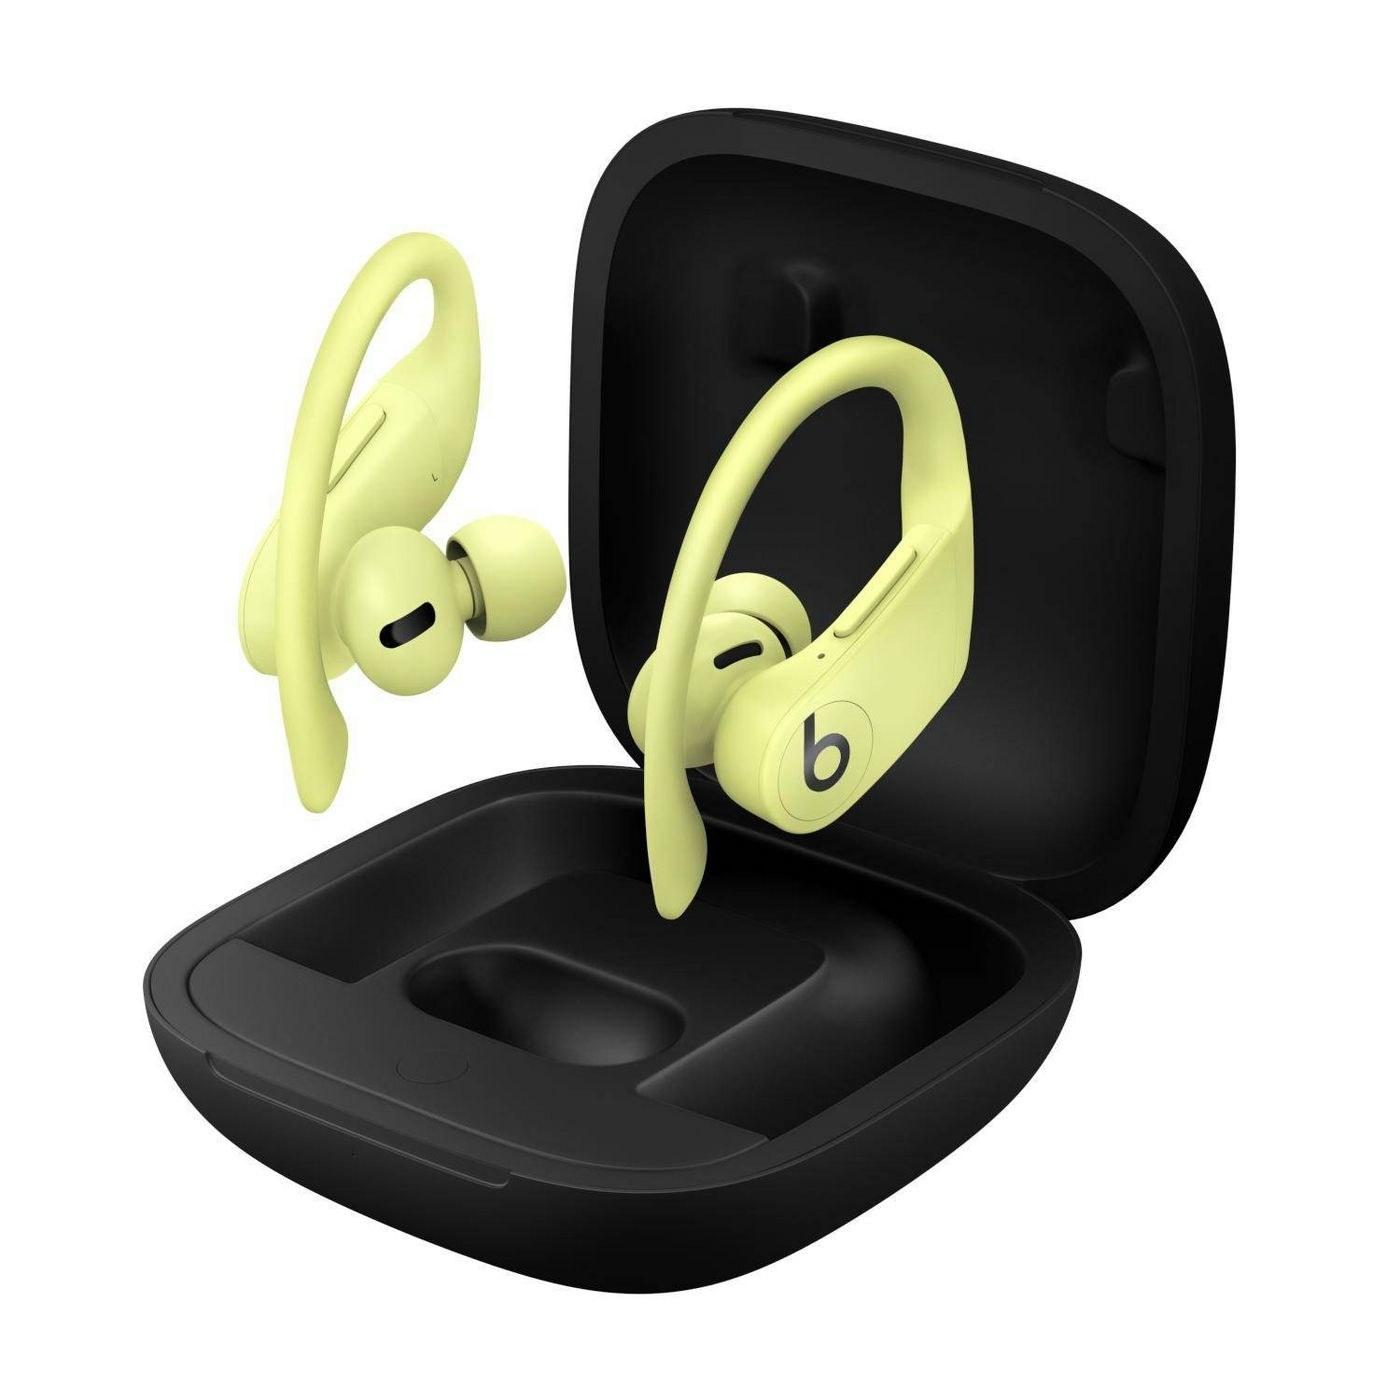 yellow powerbeats pro true wireless headphones going into a black case